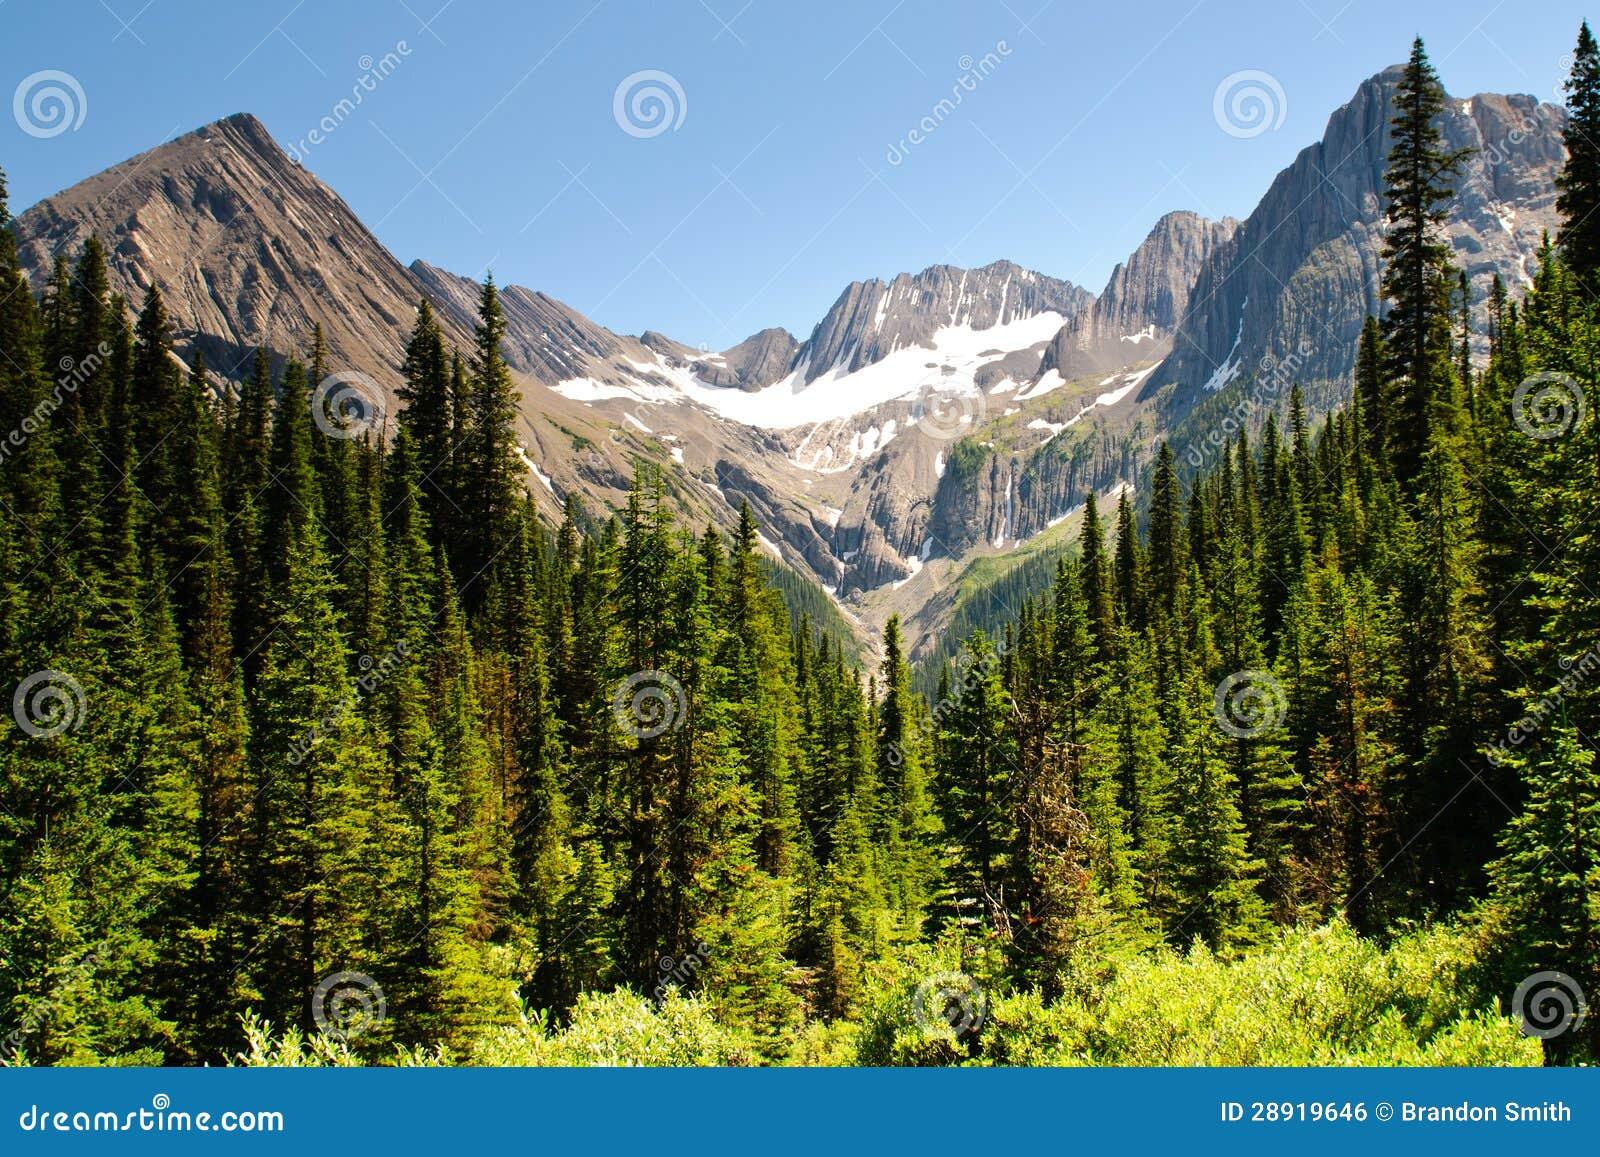 Scenic Mountain Views Kananaskis Country Alberta Canada Royalty Free ...